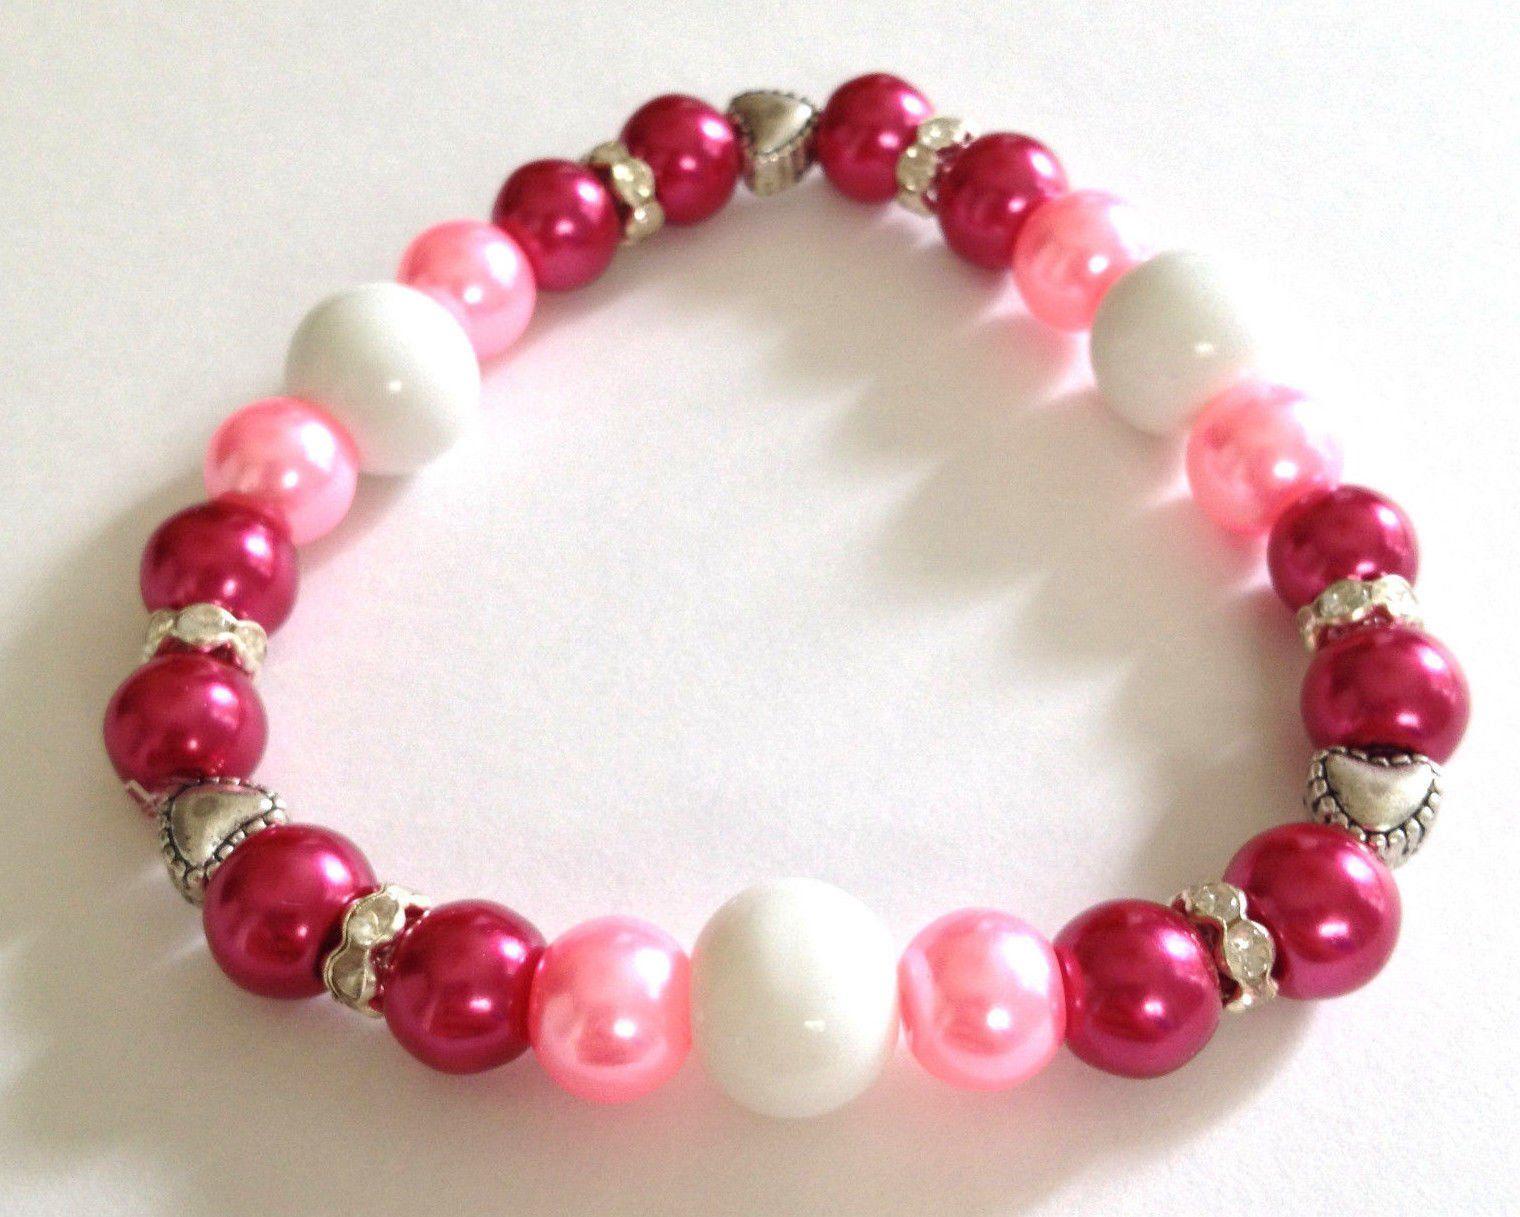 "#Trending04 - Valentine's Day Stretch Bracelet 7"" Handmade Women's Jewelry https://t.co/exo2fixlqc Ebay https://t.co/vv6BOWV7Nj"